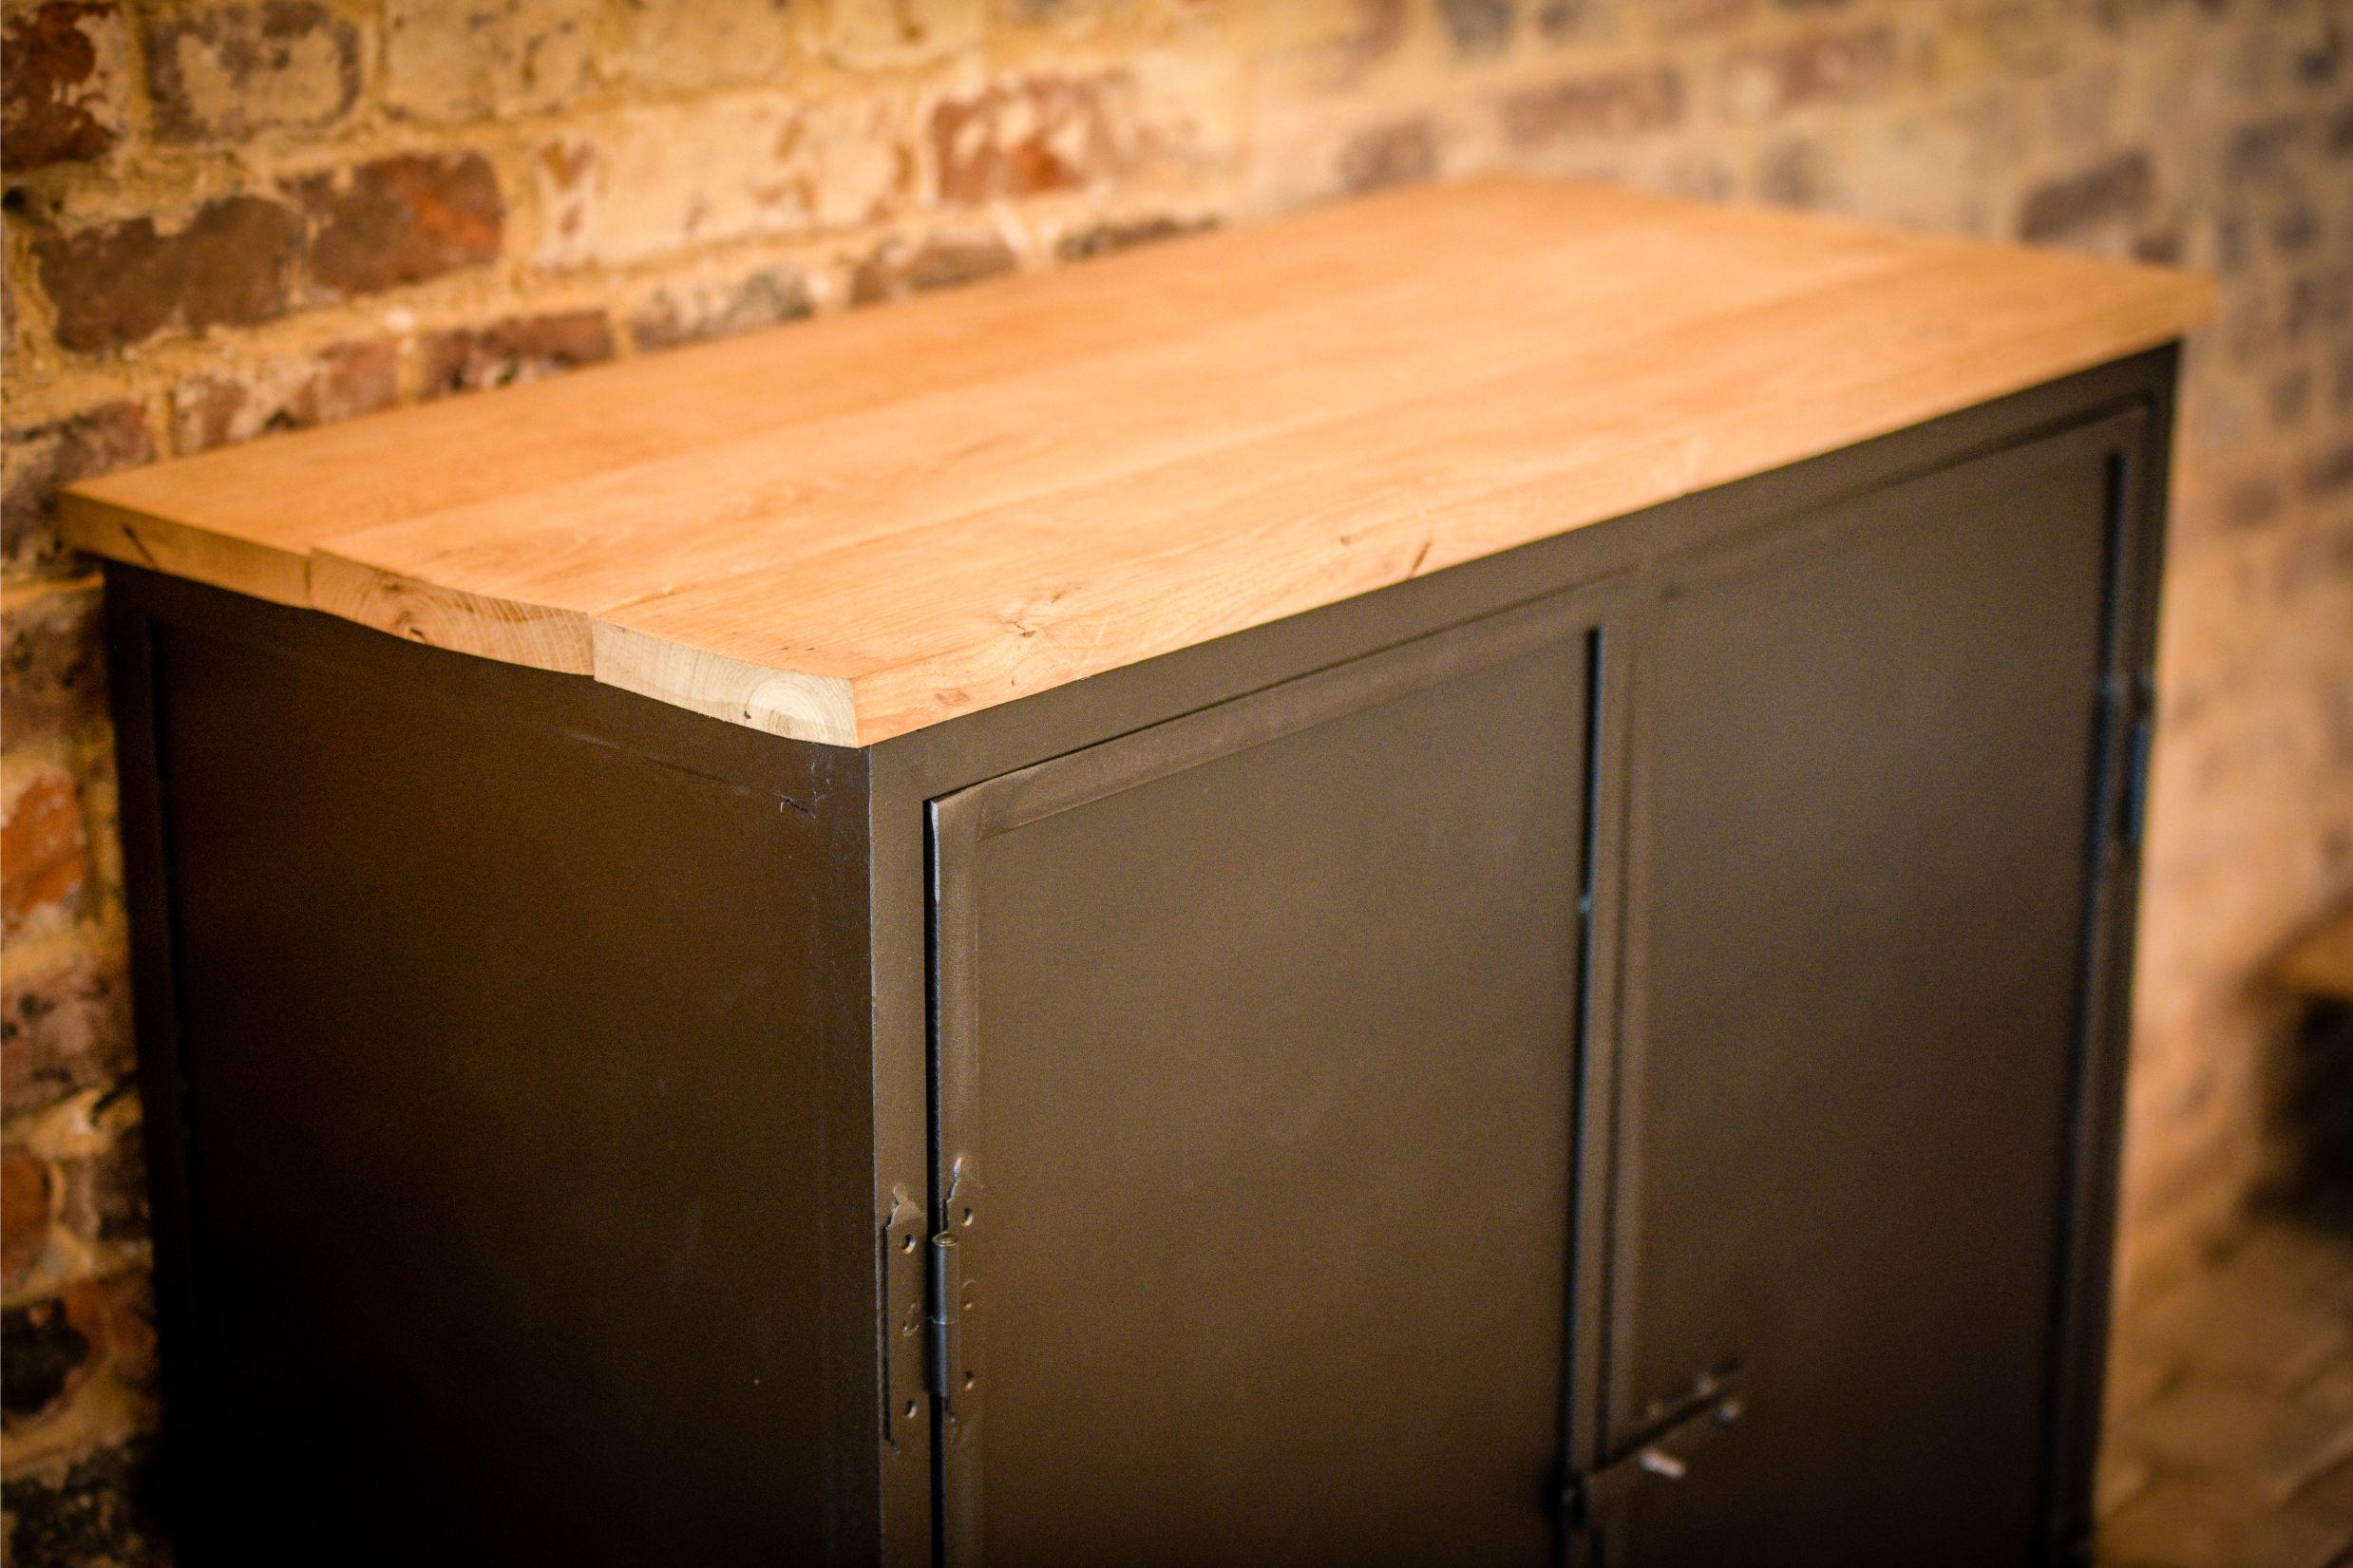 Stalen kastje met planken tablet in eik, deurtjes in staal